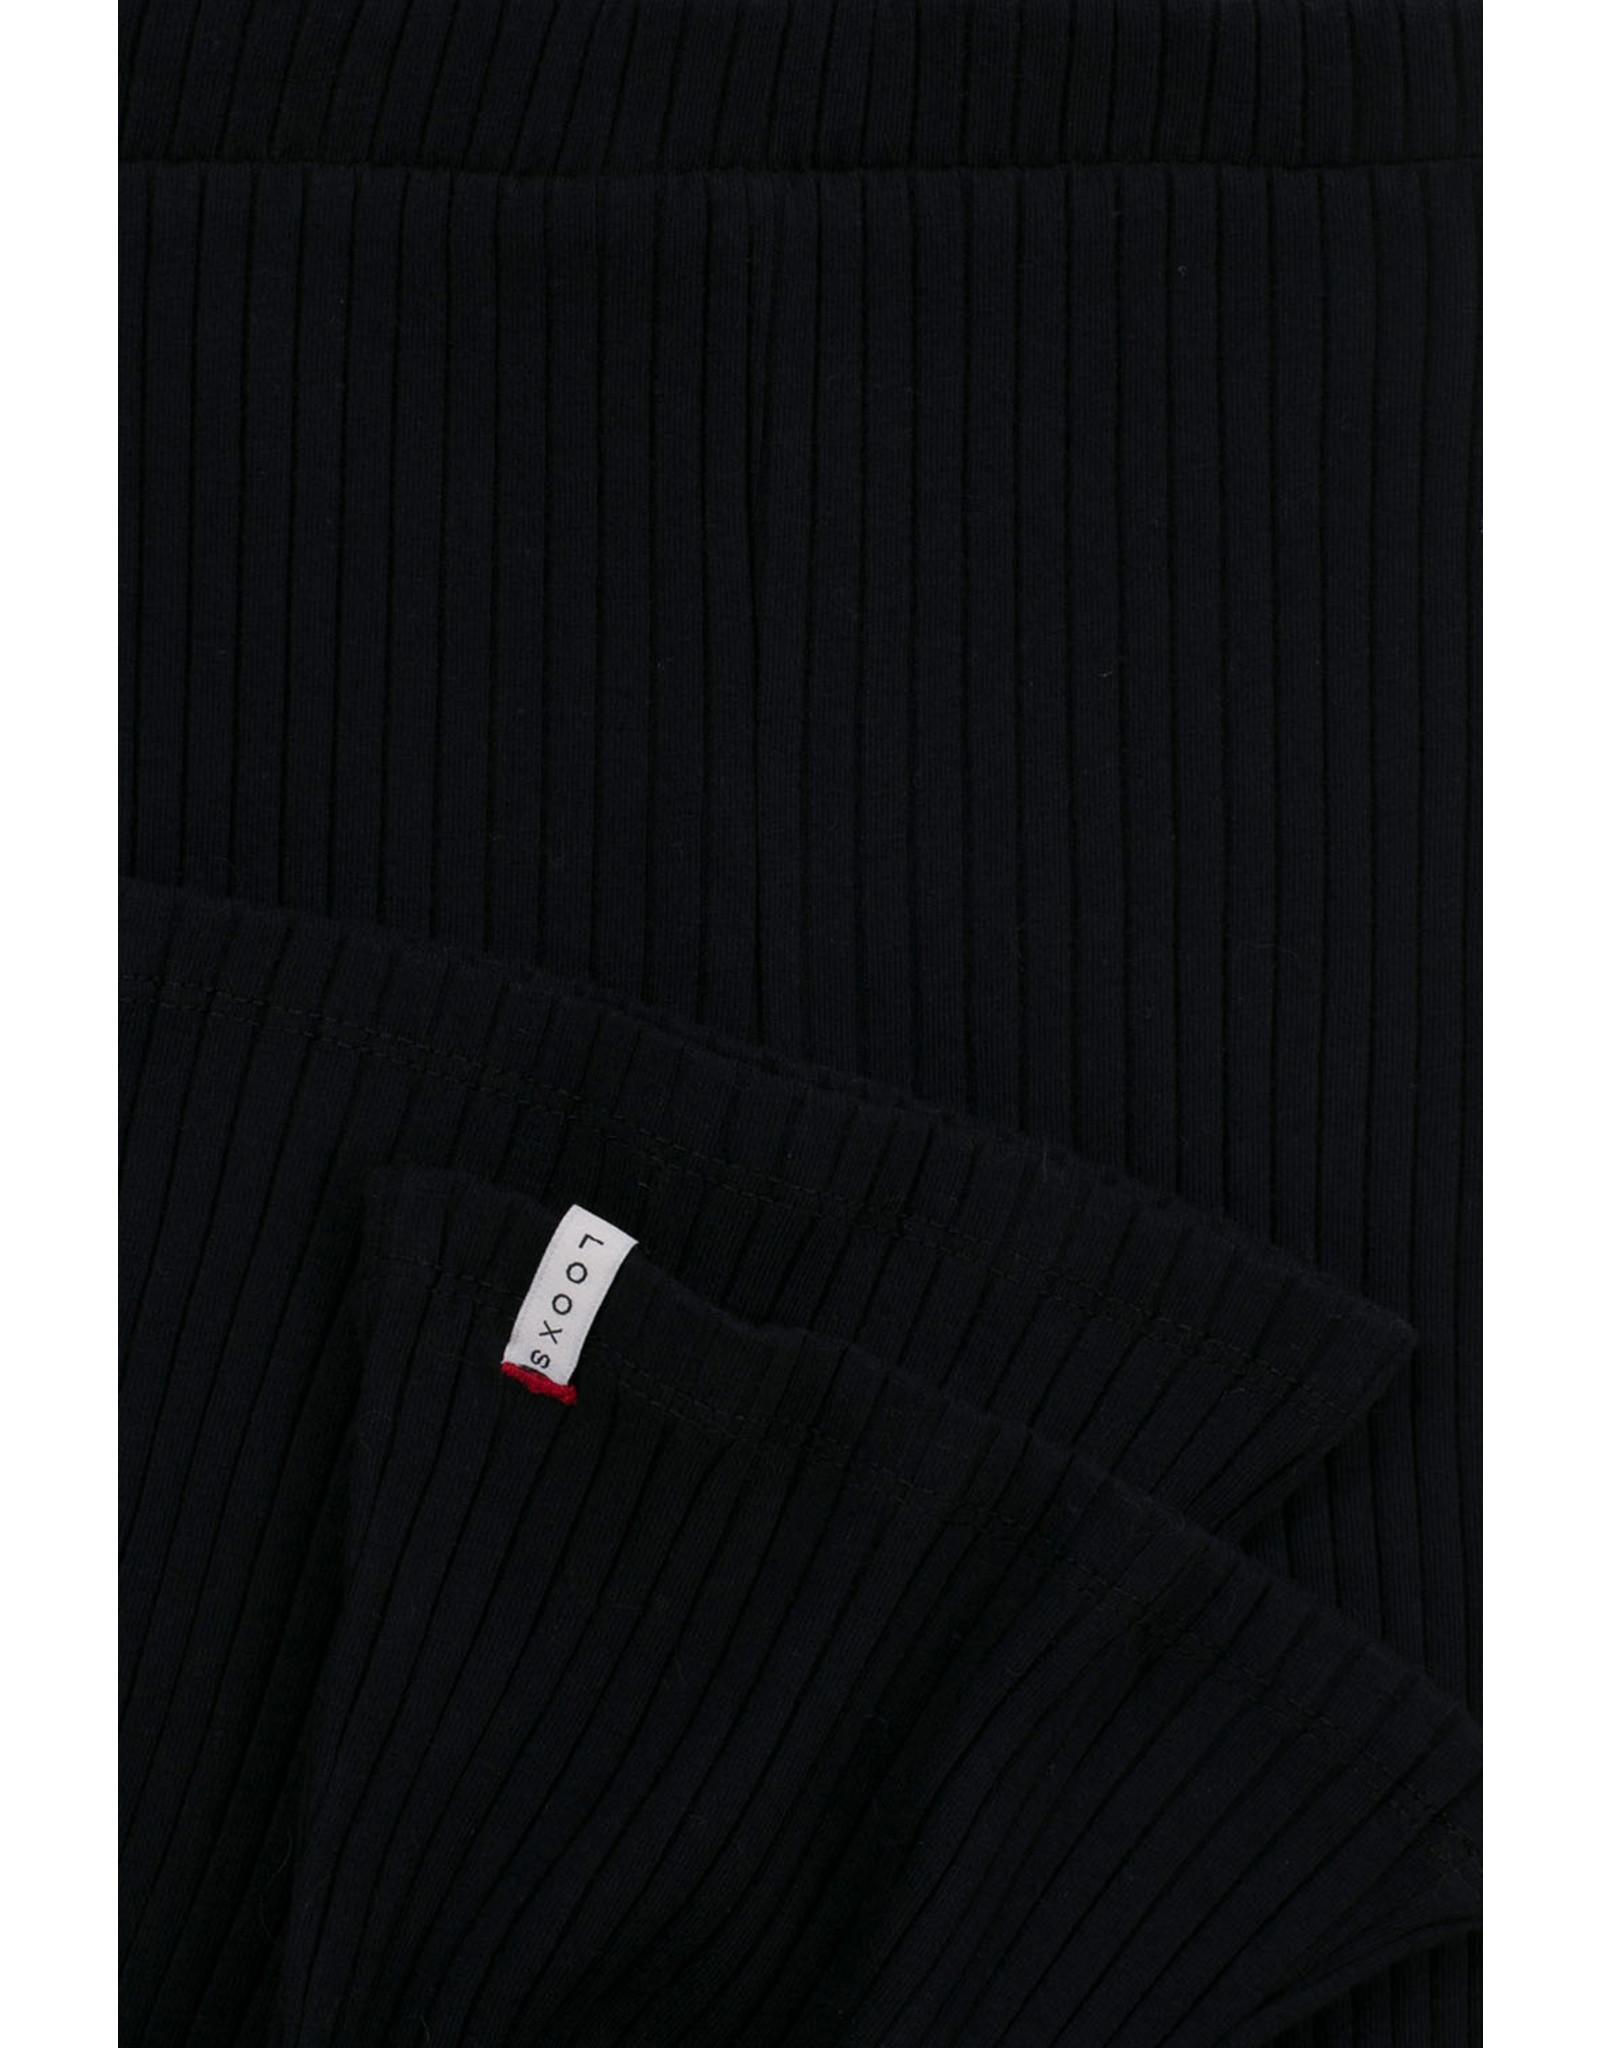 Looxs 10Sixteen Tie dye flare pants black